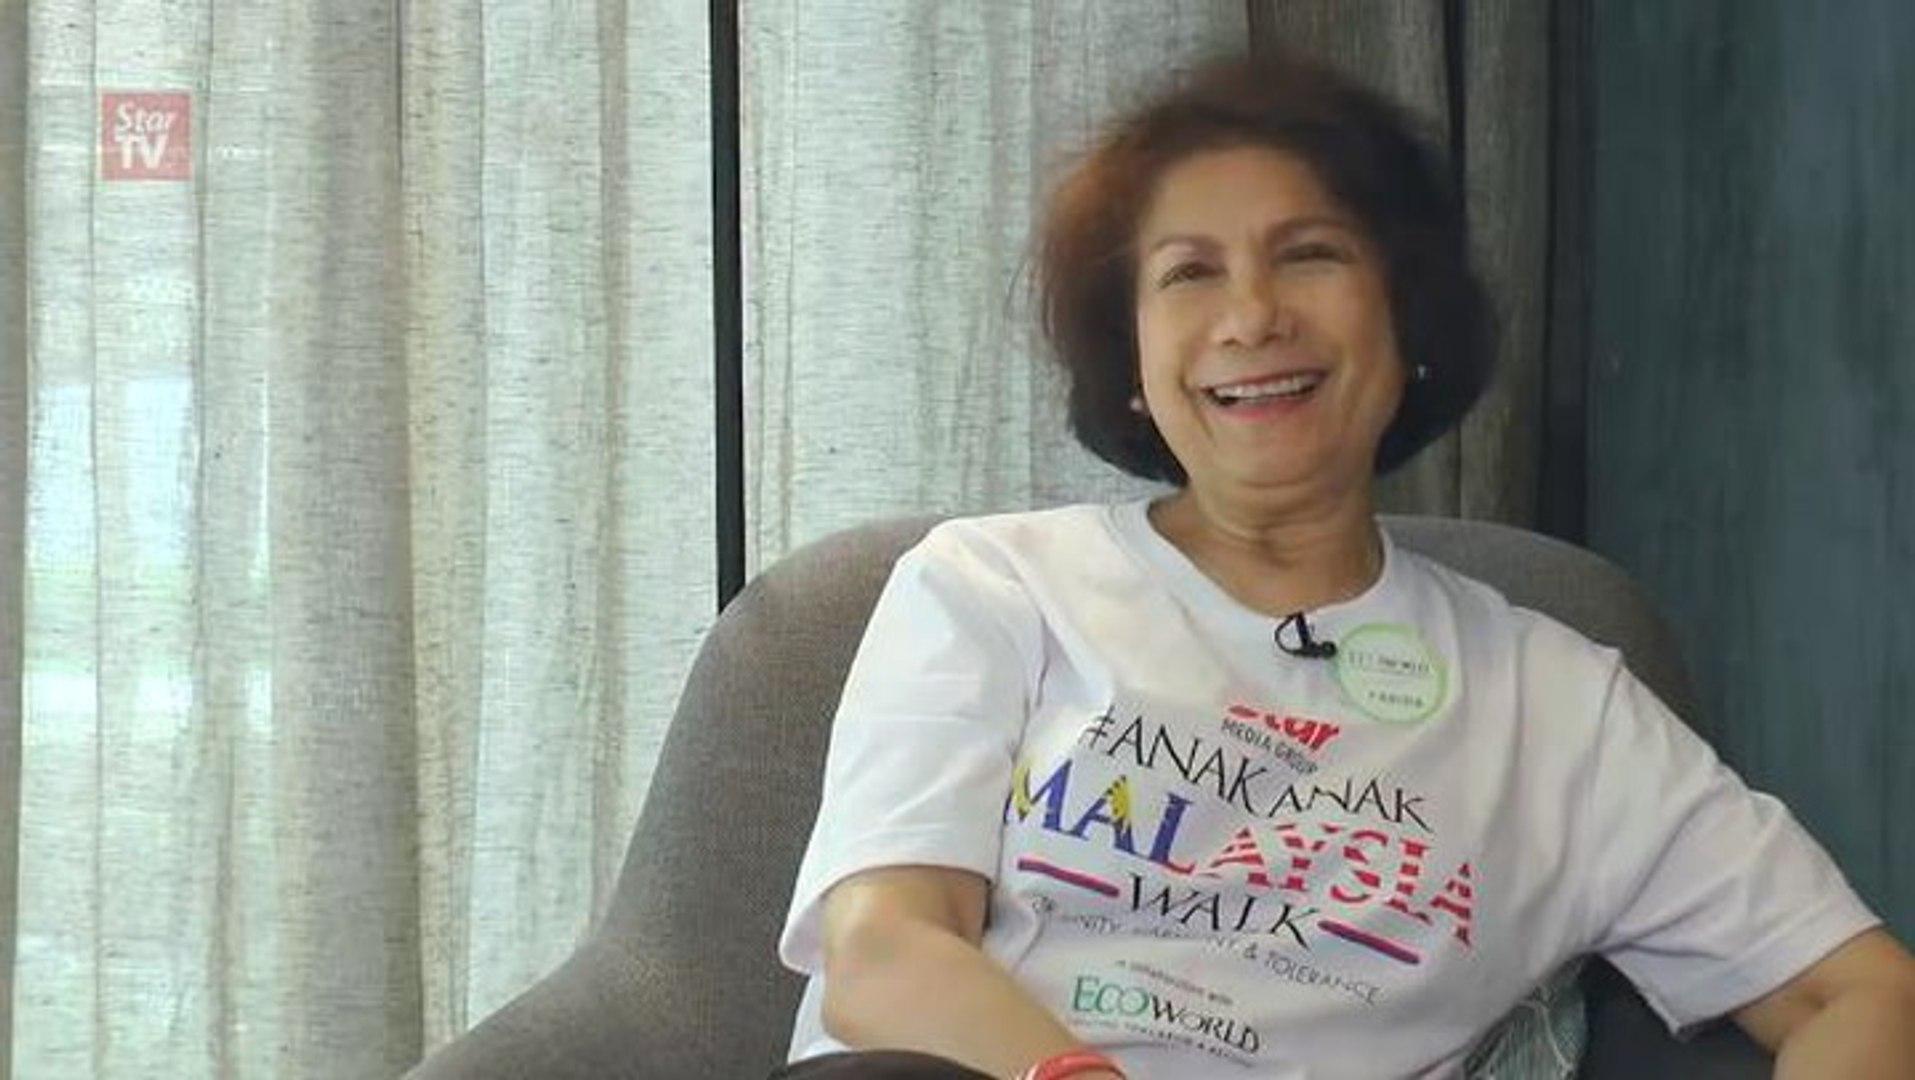 #AnakAnakMalaysia Walk: Diplomat and social entrepreneur